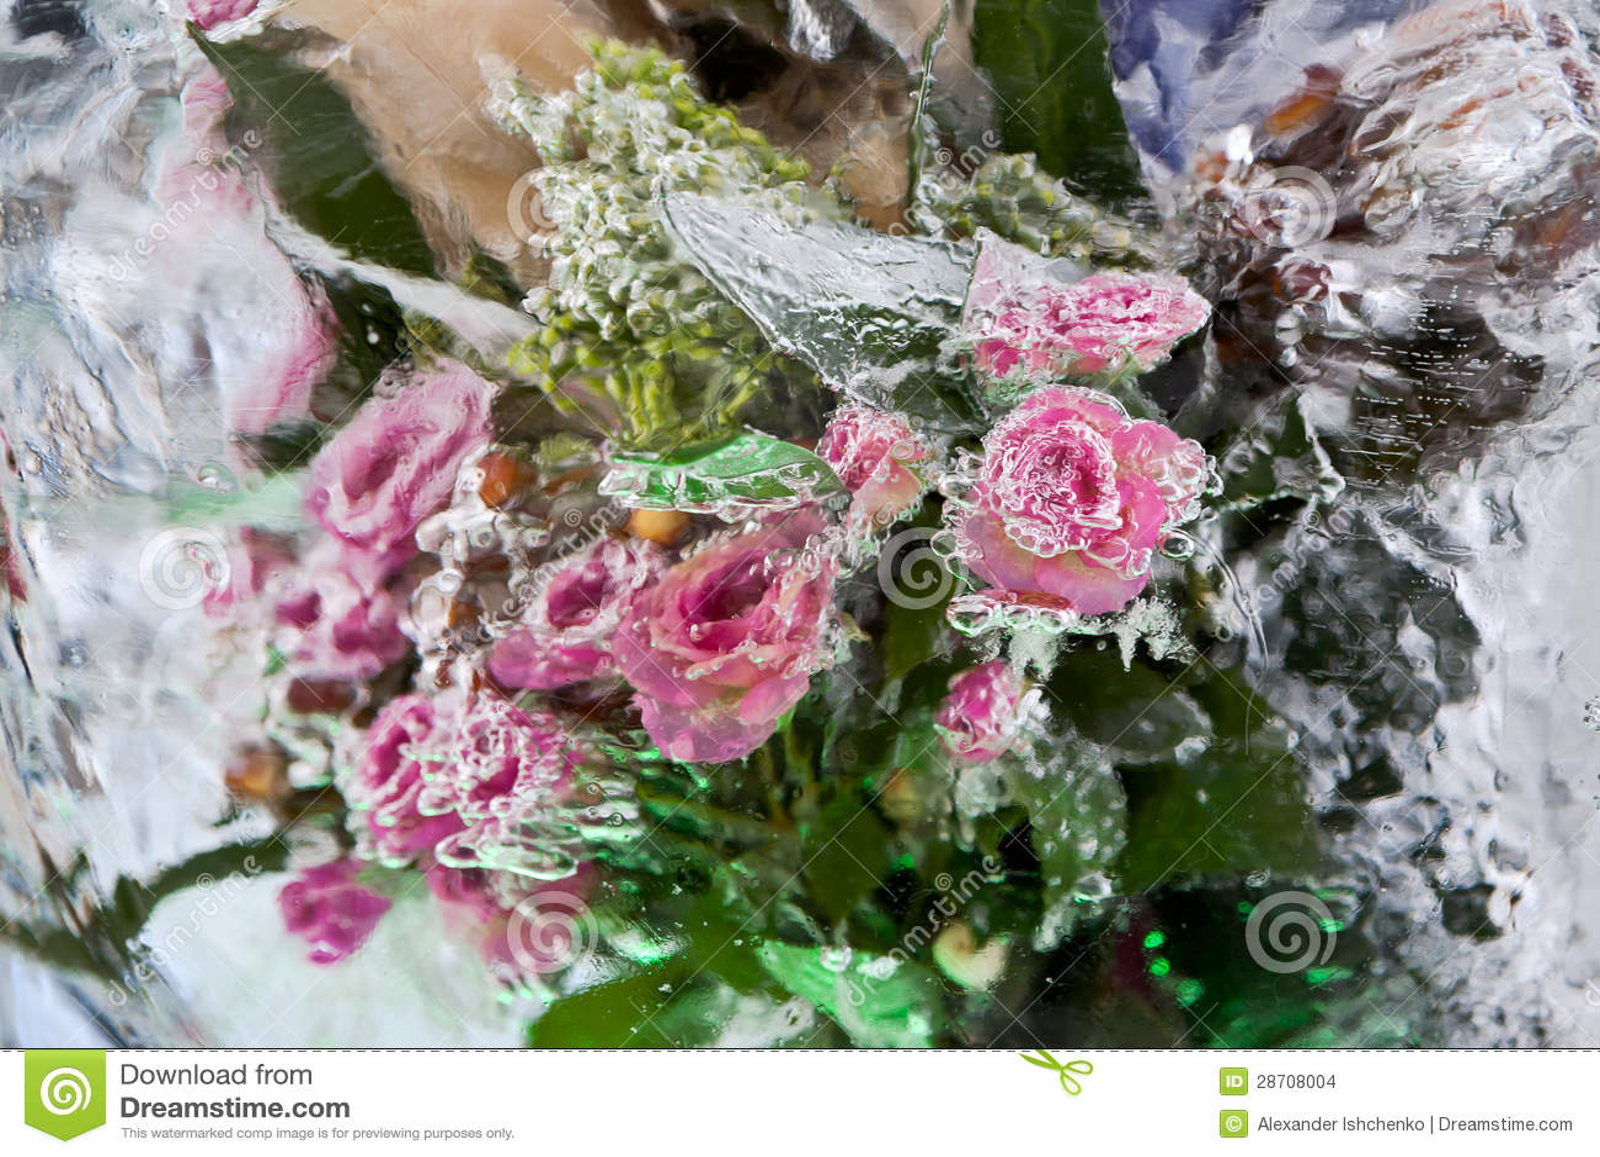 Frozen Flowers Stock Image